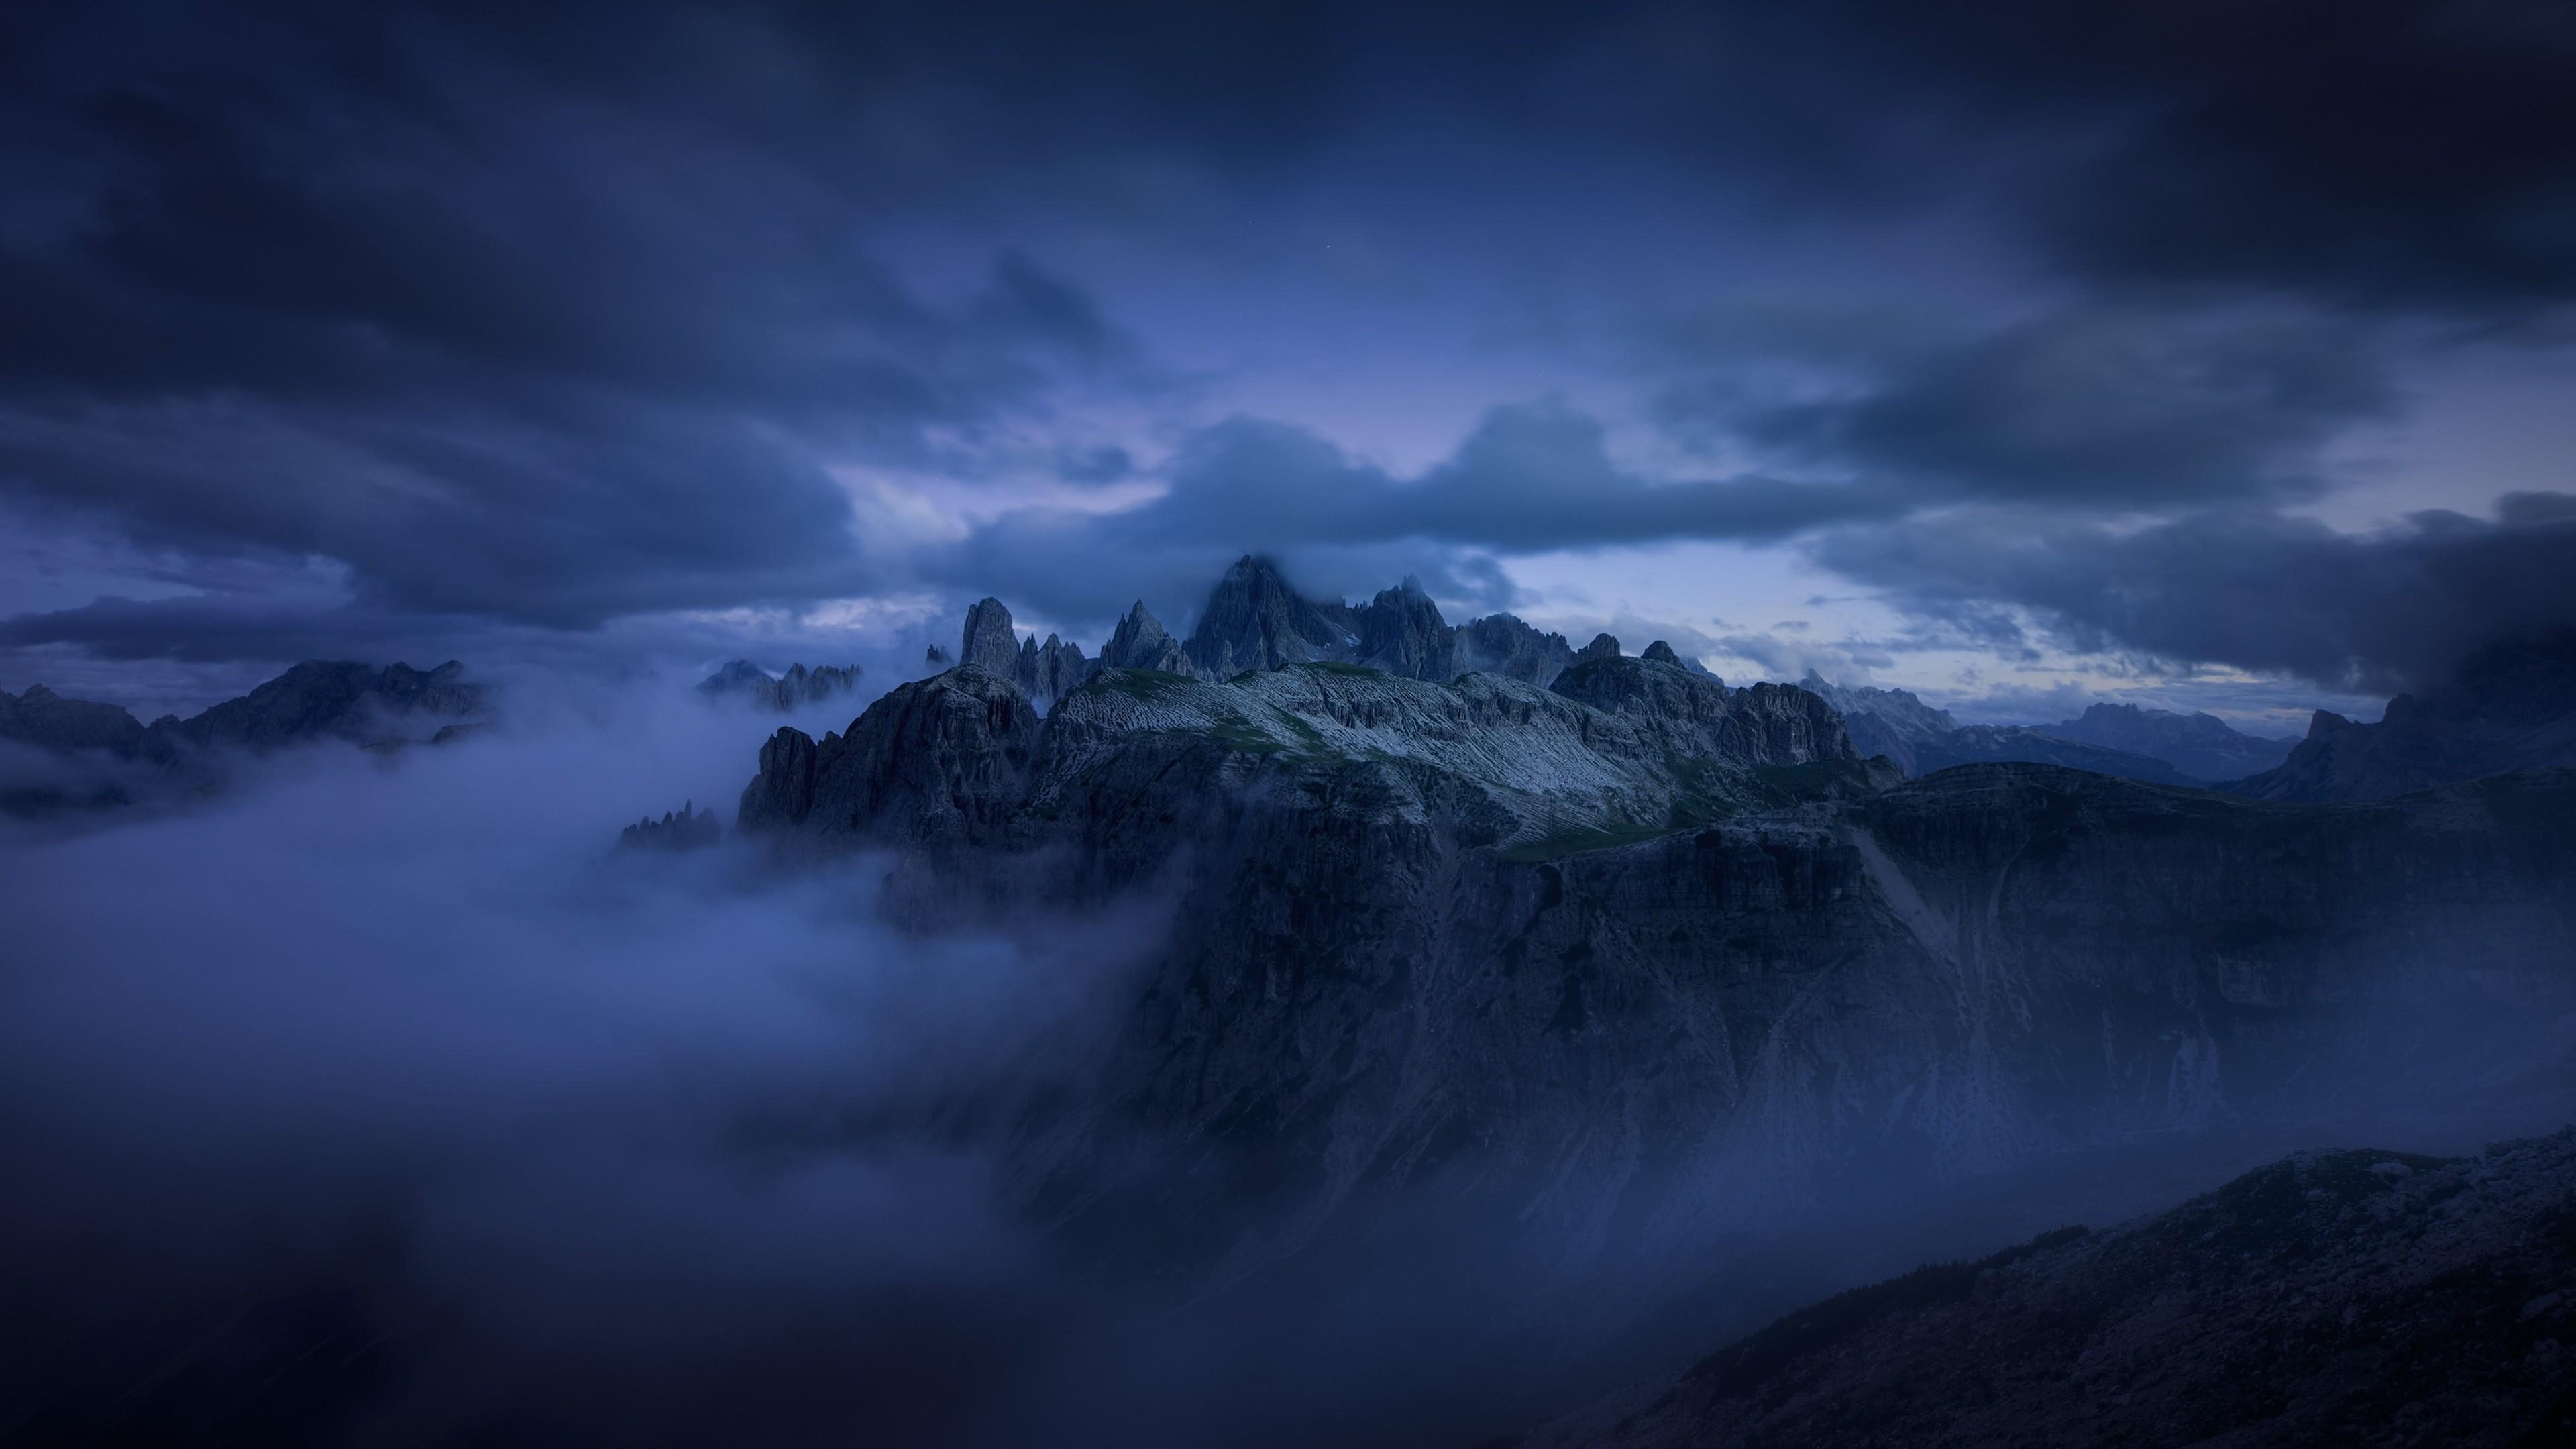 Res: 3840x2160, Mountain, Evening, Fog, Cliff, Dark Clouds